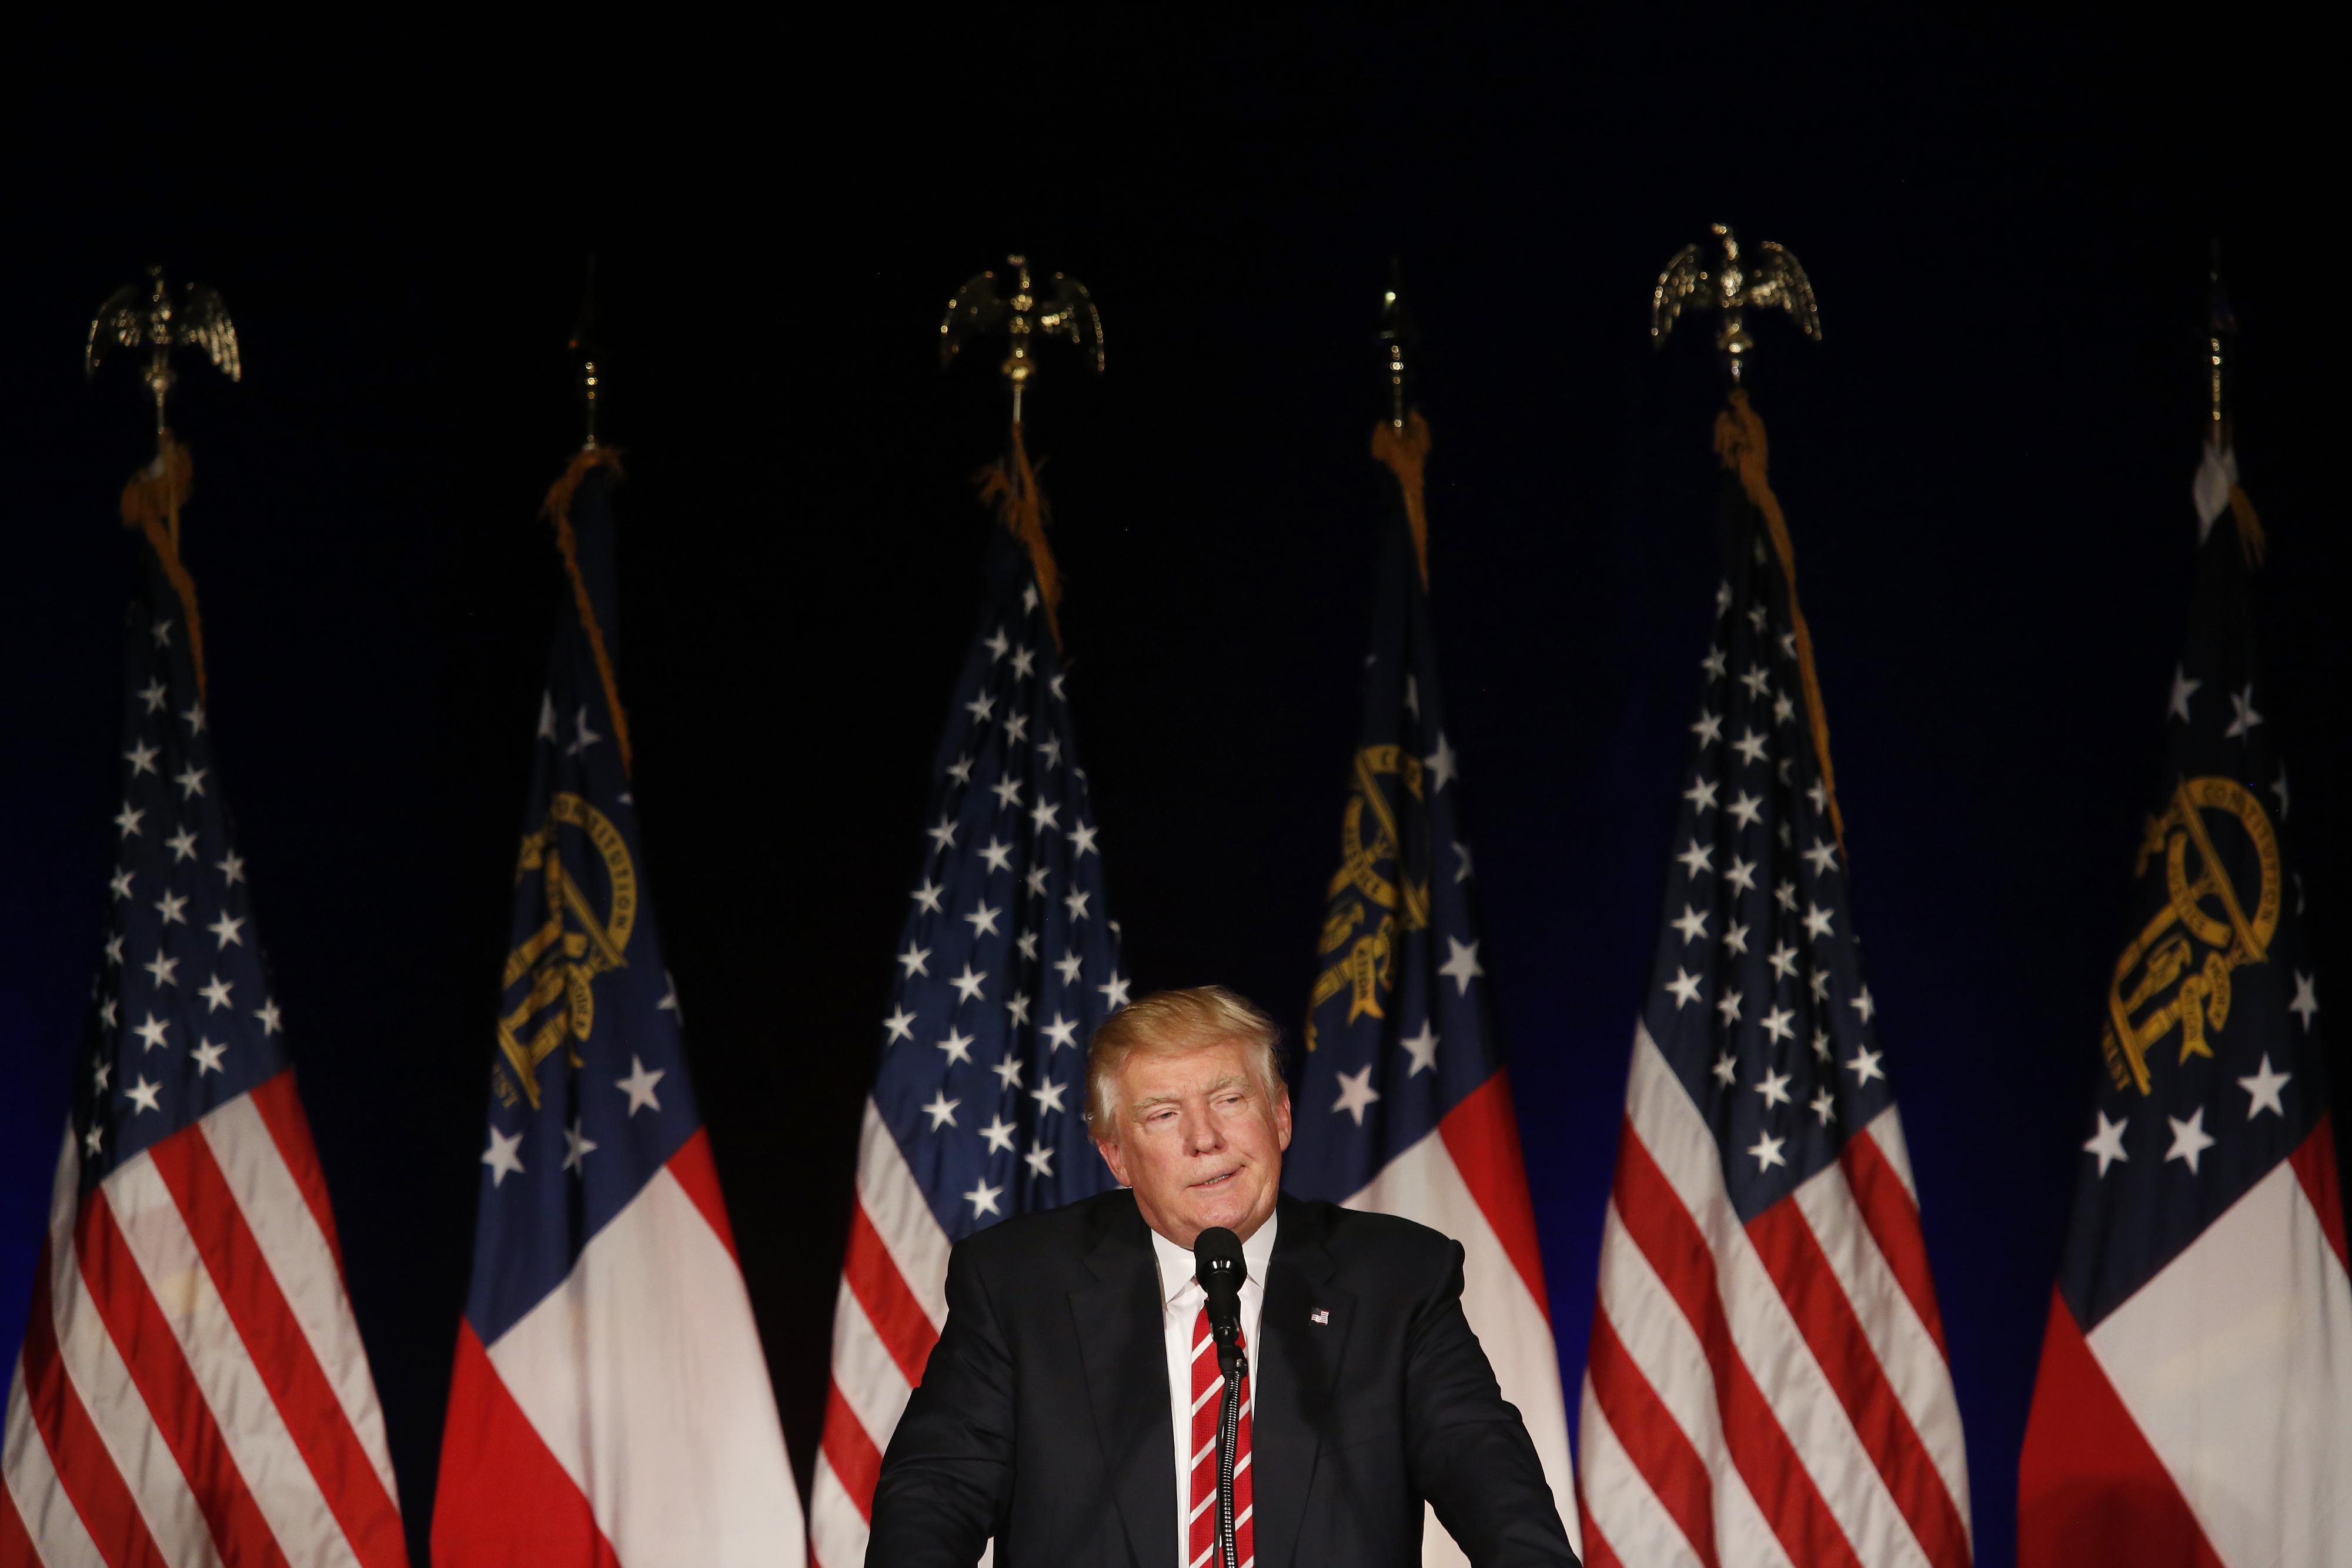 Donald Trump speaks during a campaign event in Atlanta, Georgia, on June 15, 2016.